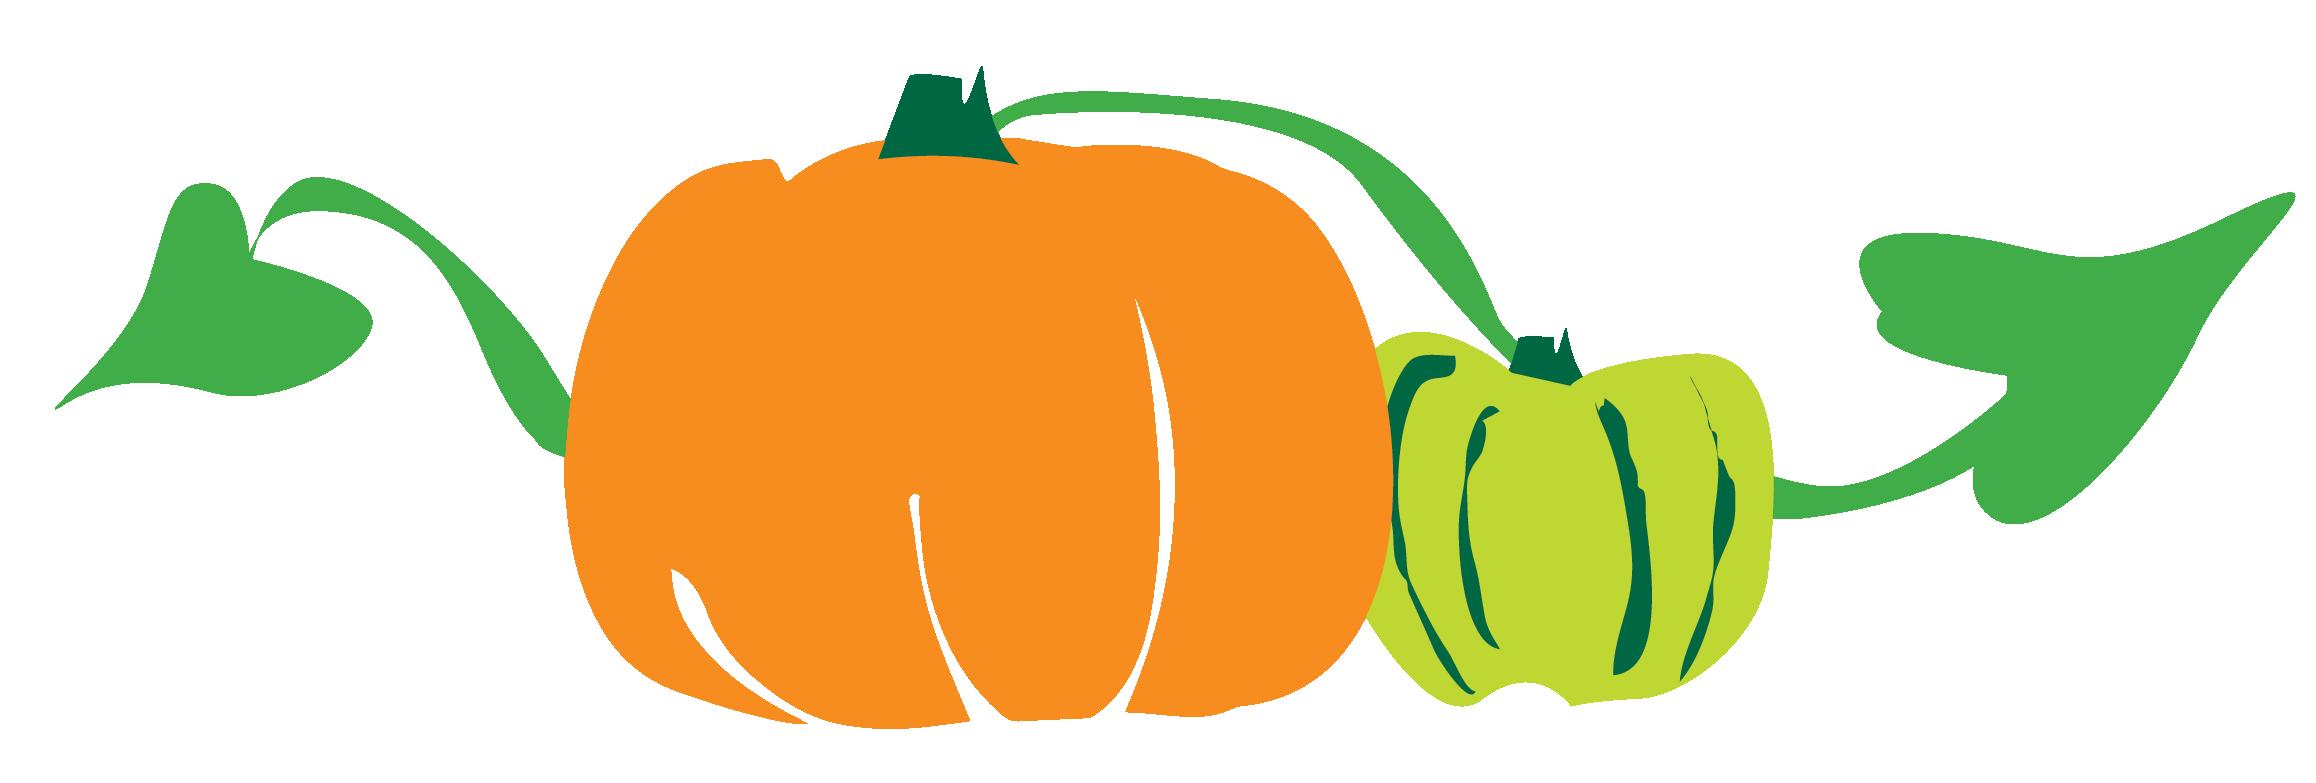 Pumpkin clipart hayride. Tours october about